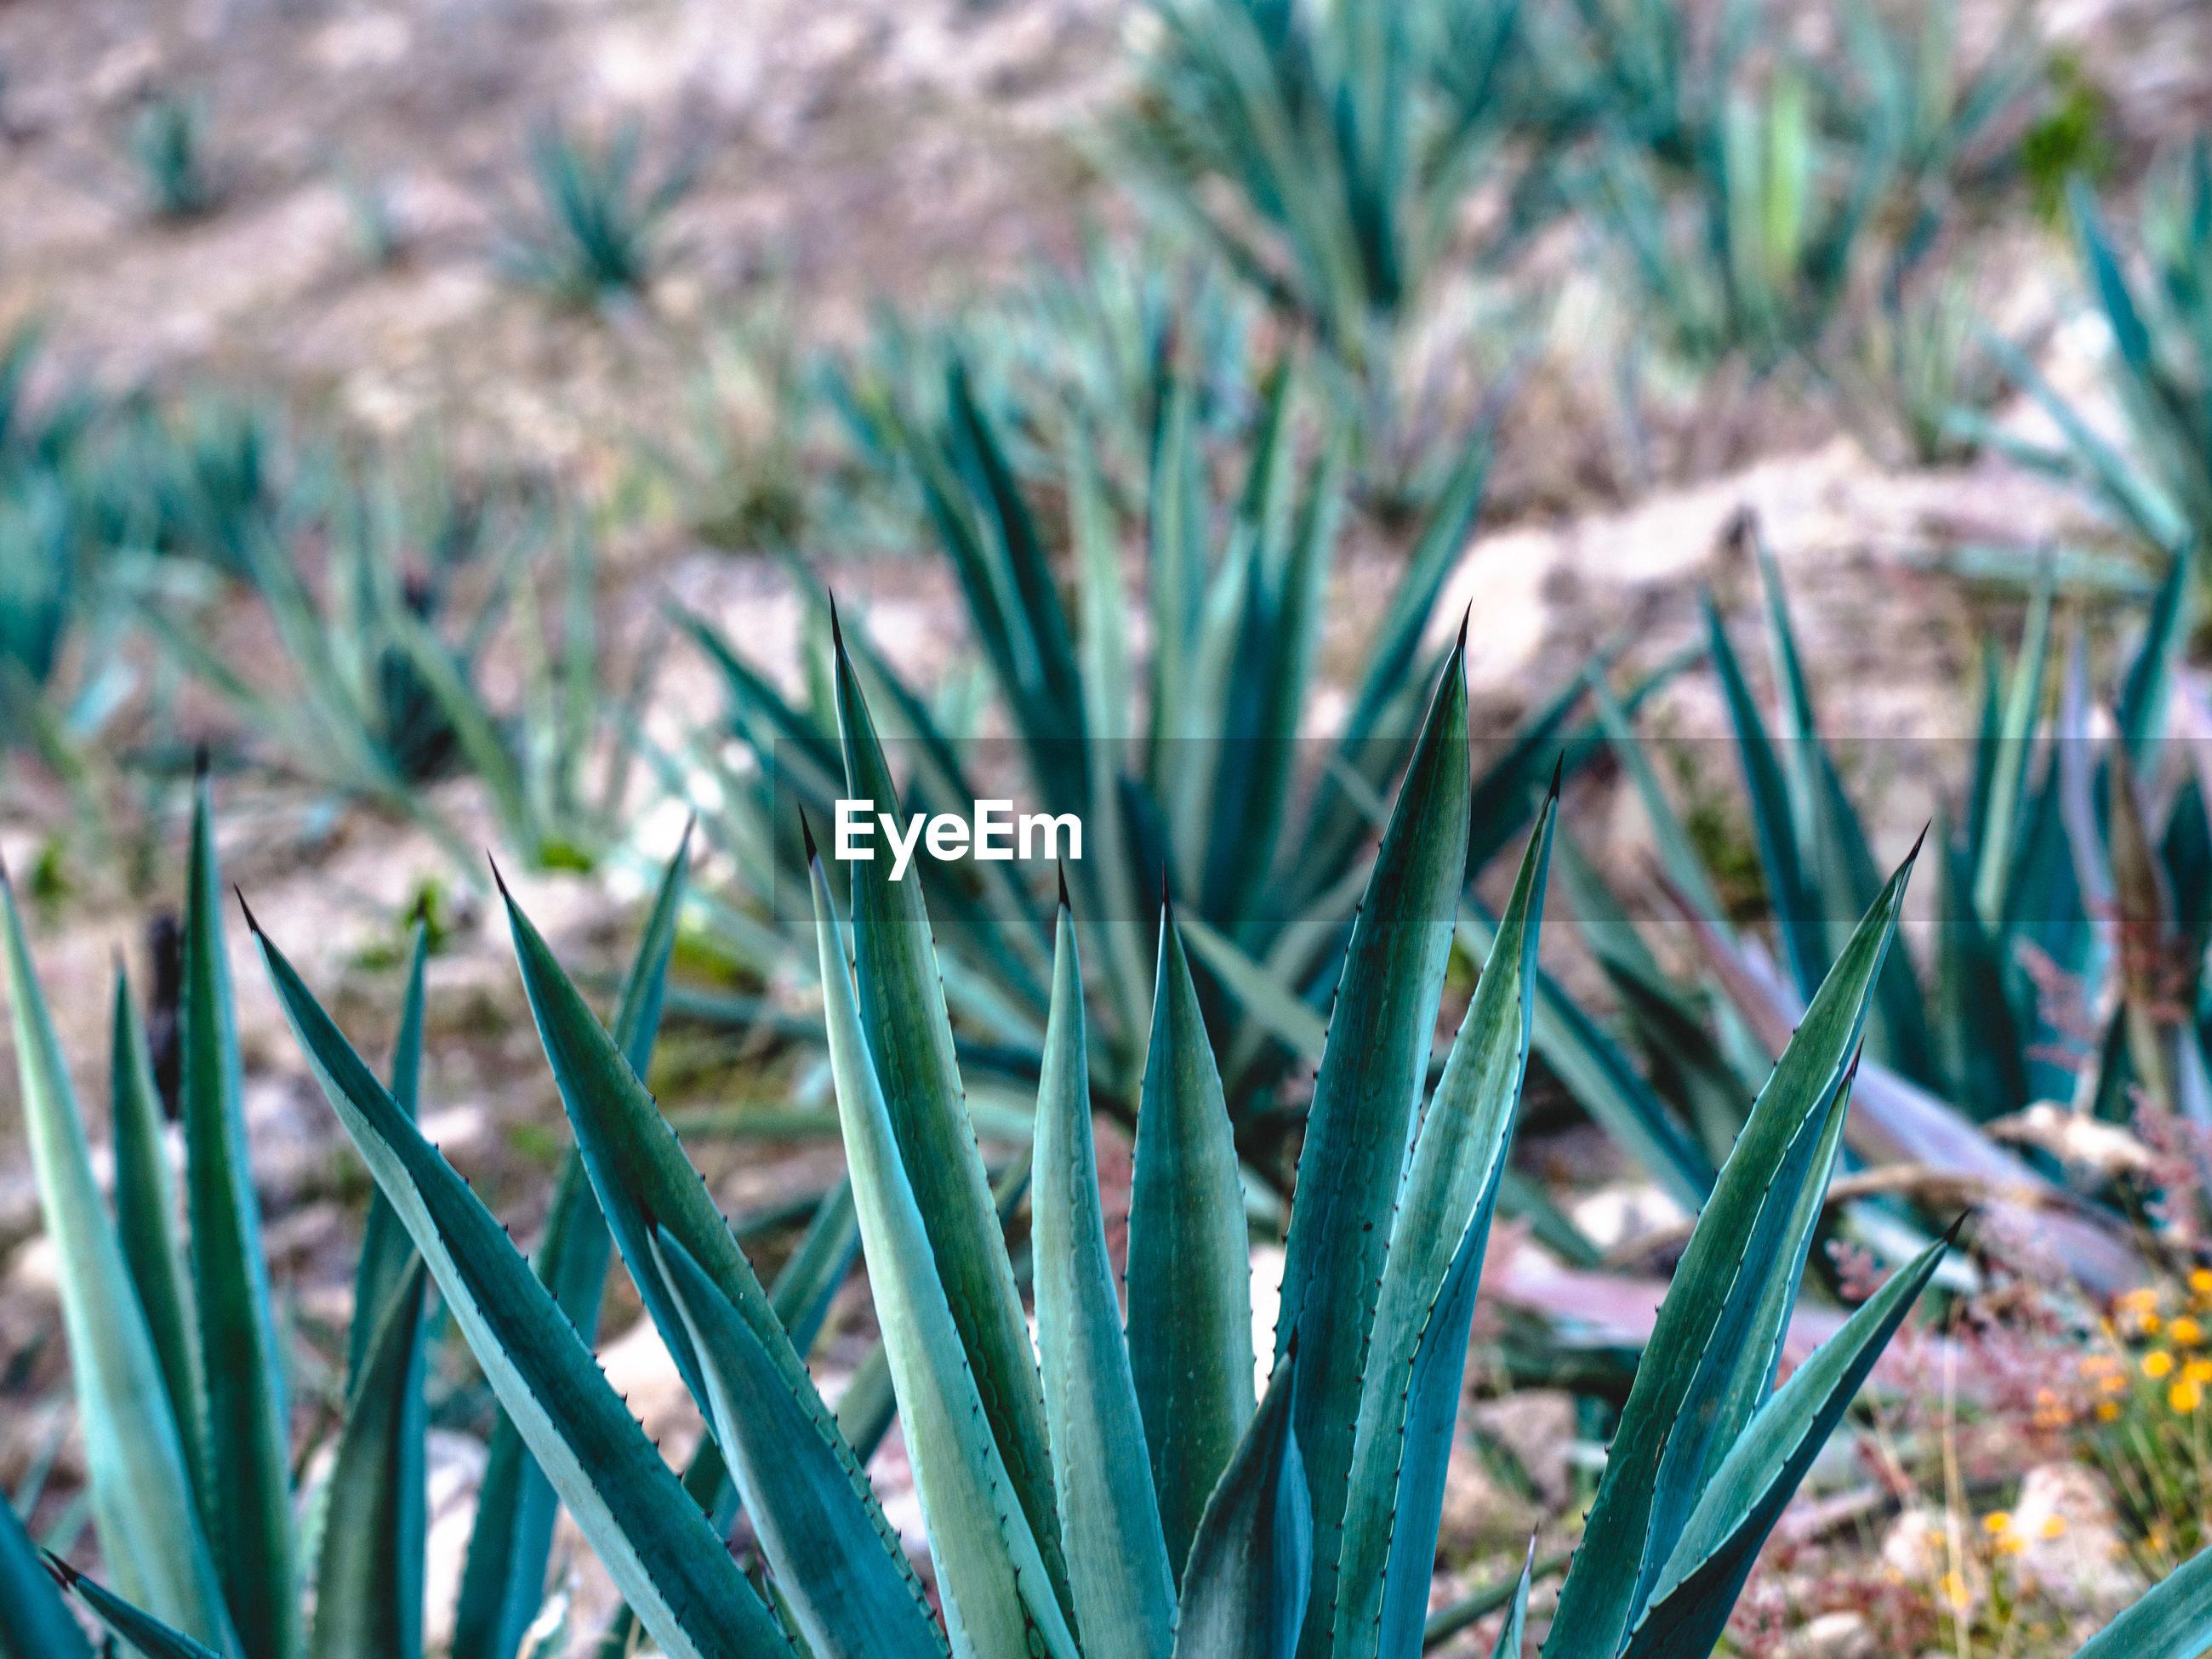 Cactuses growing on field